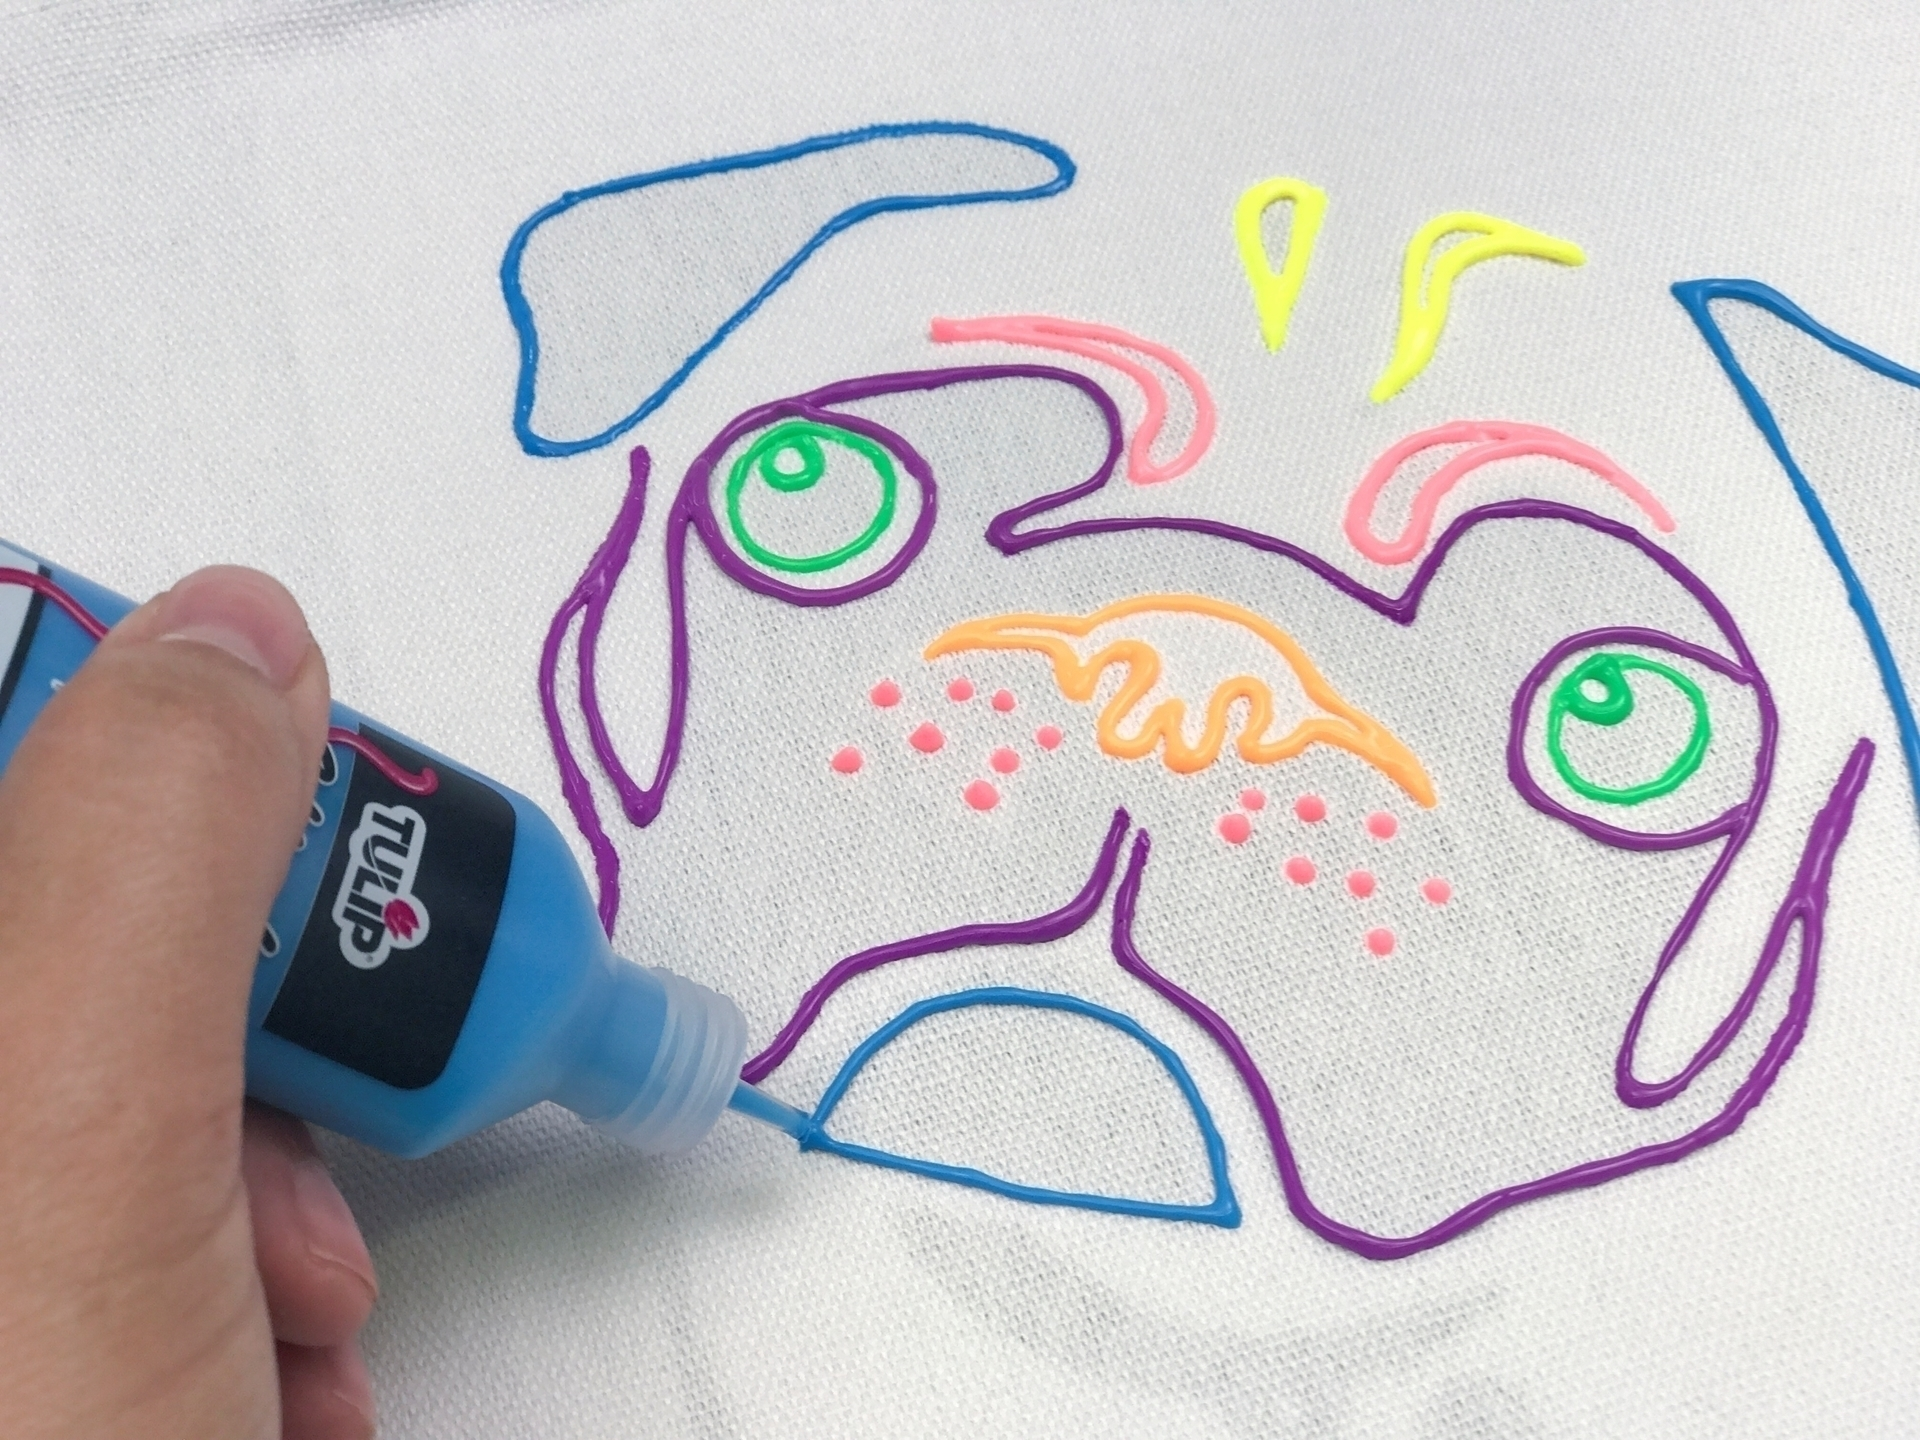 consectetur adipisicing Fabric Paints FAQs